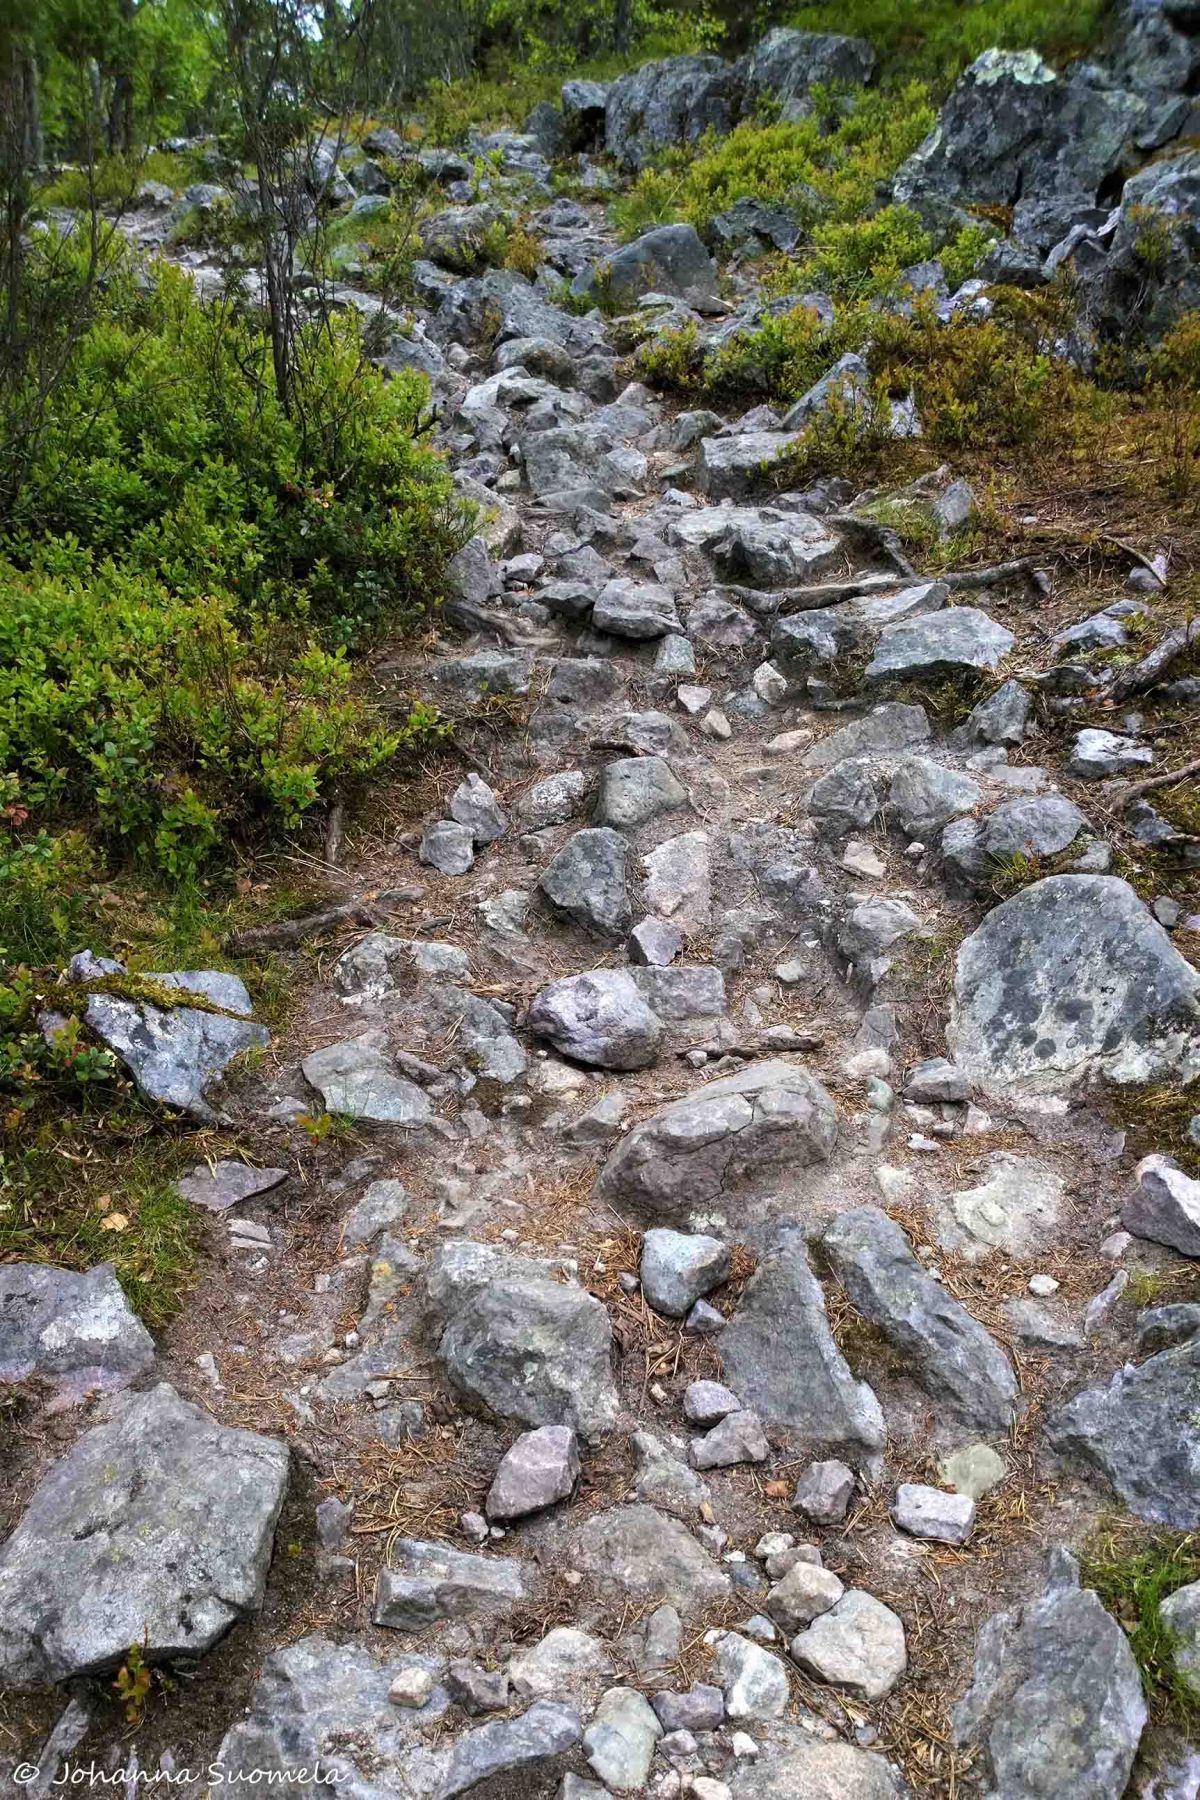 Karhunkierros kivinen nousu 20180613172026-2